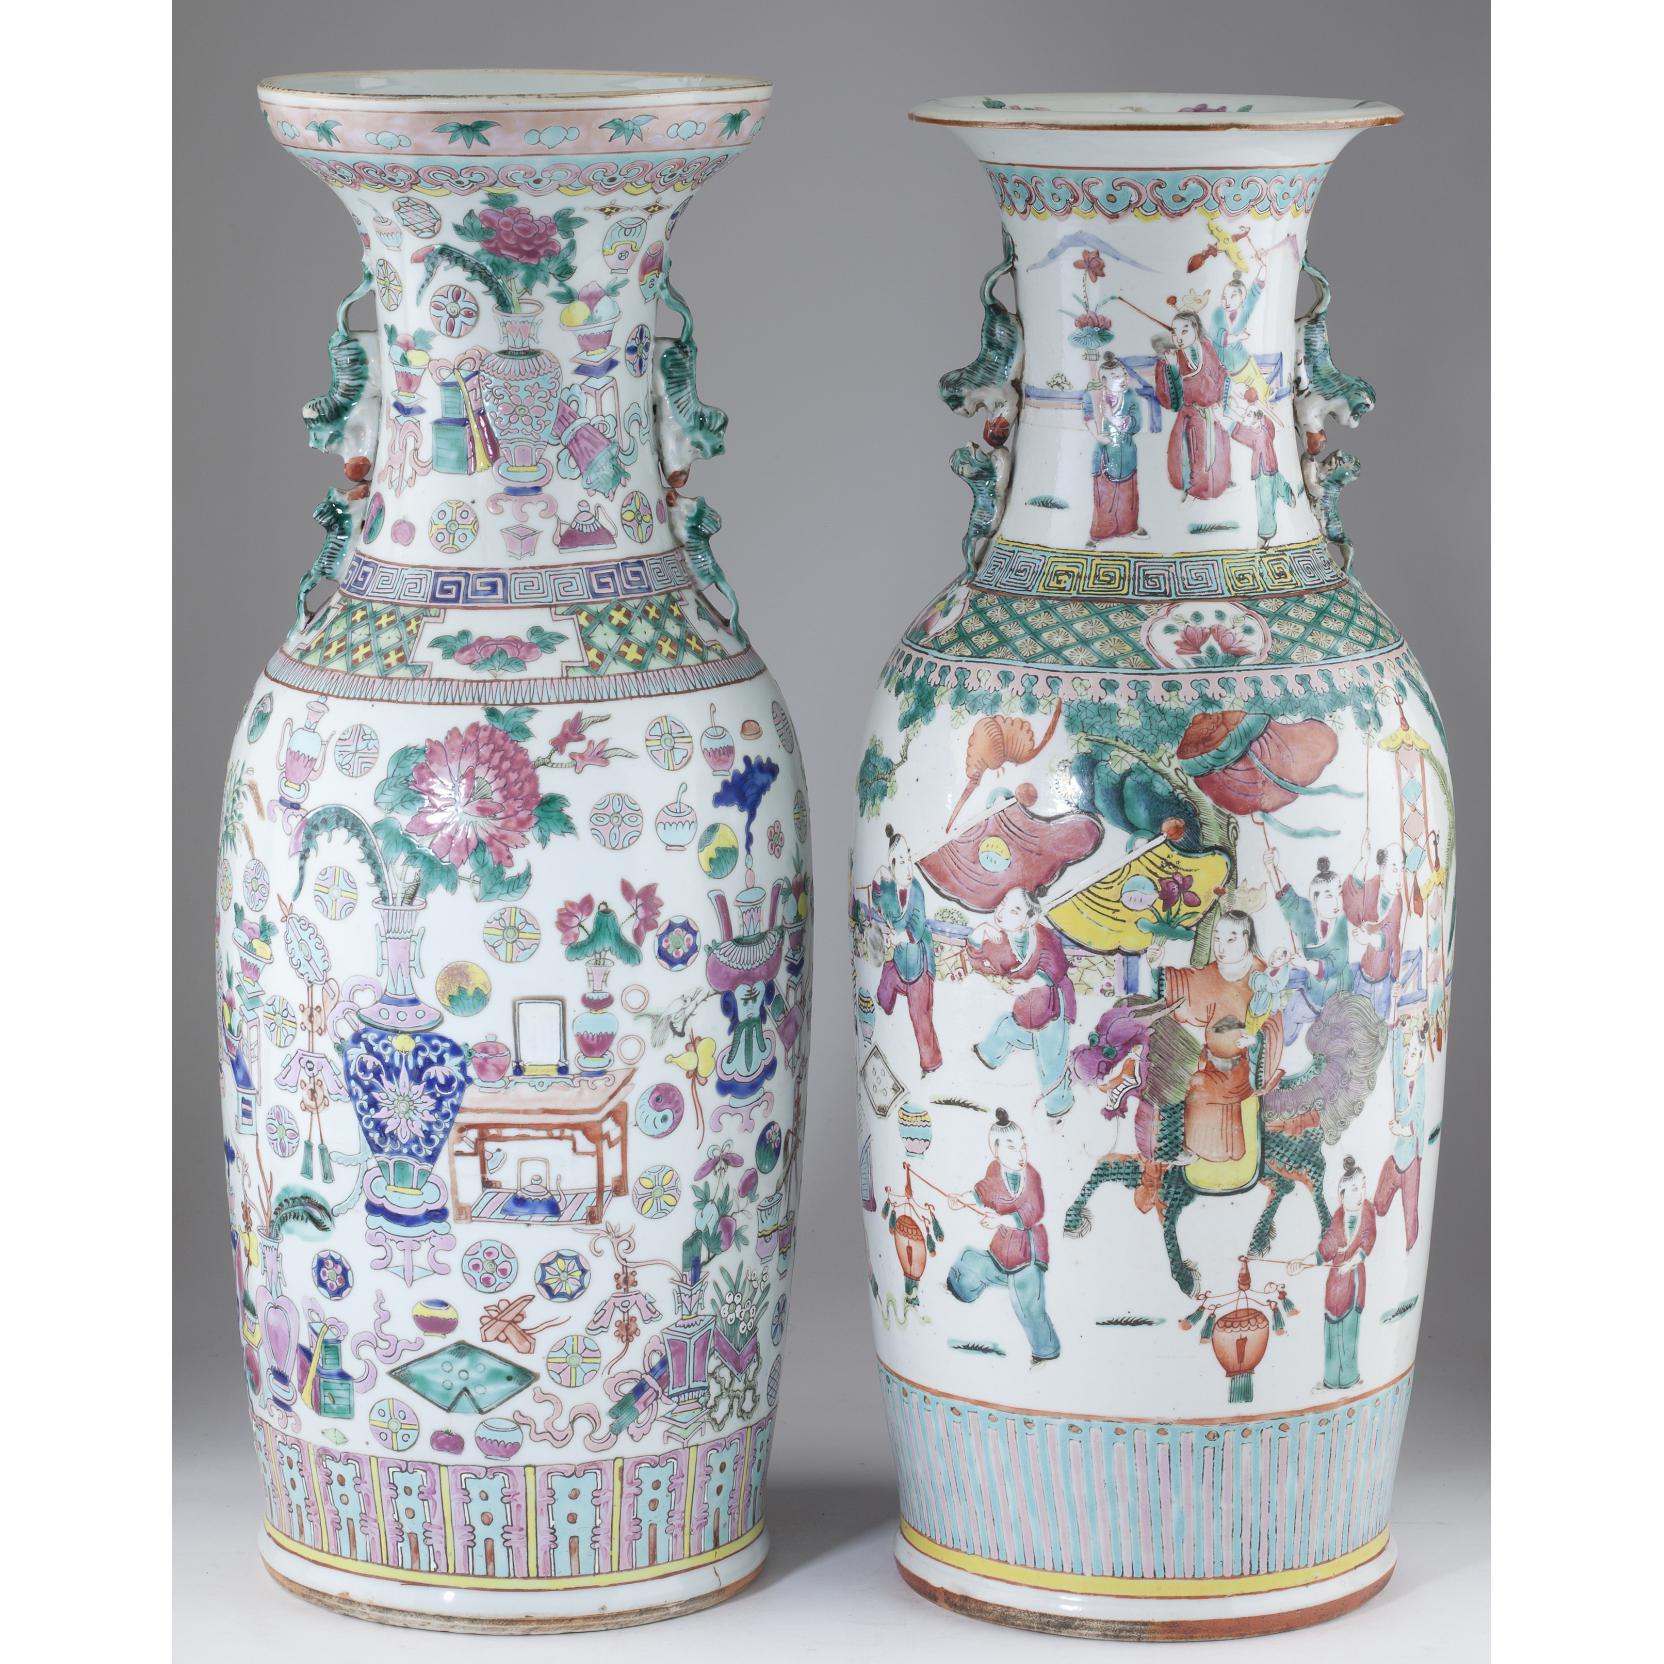 two-similar-chinese-porcelain-floor-vases